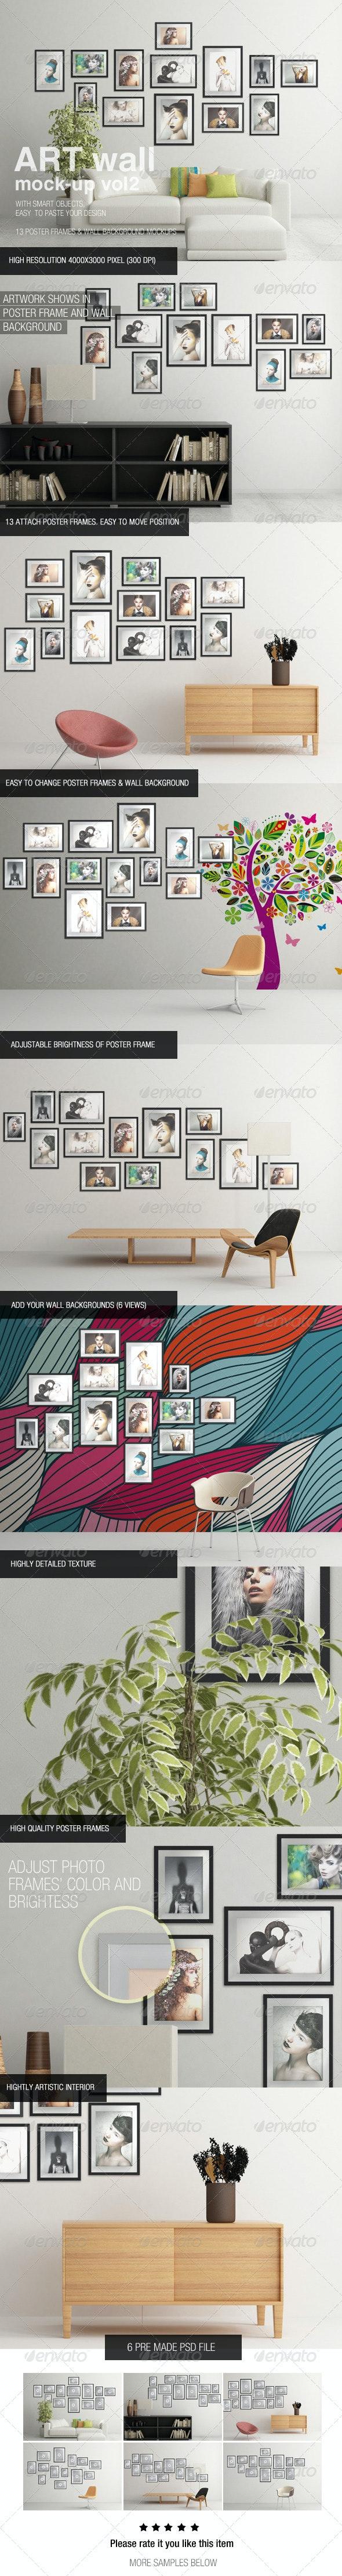 Art Wall Mock-Up Vol.2 - Posters Print